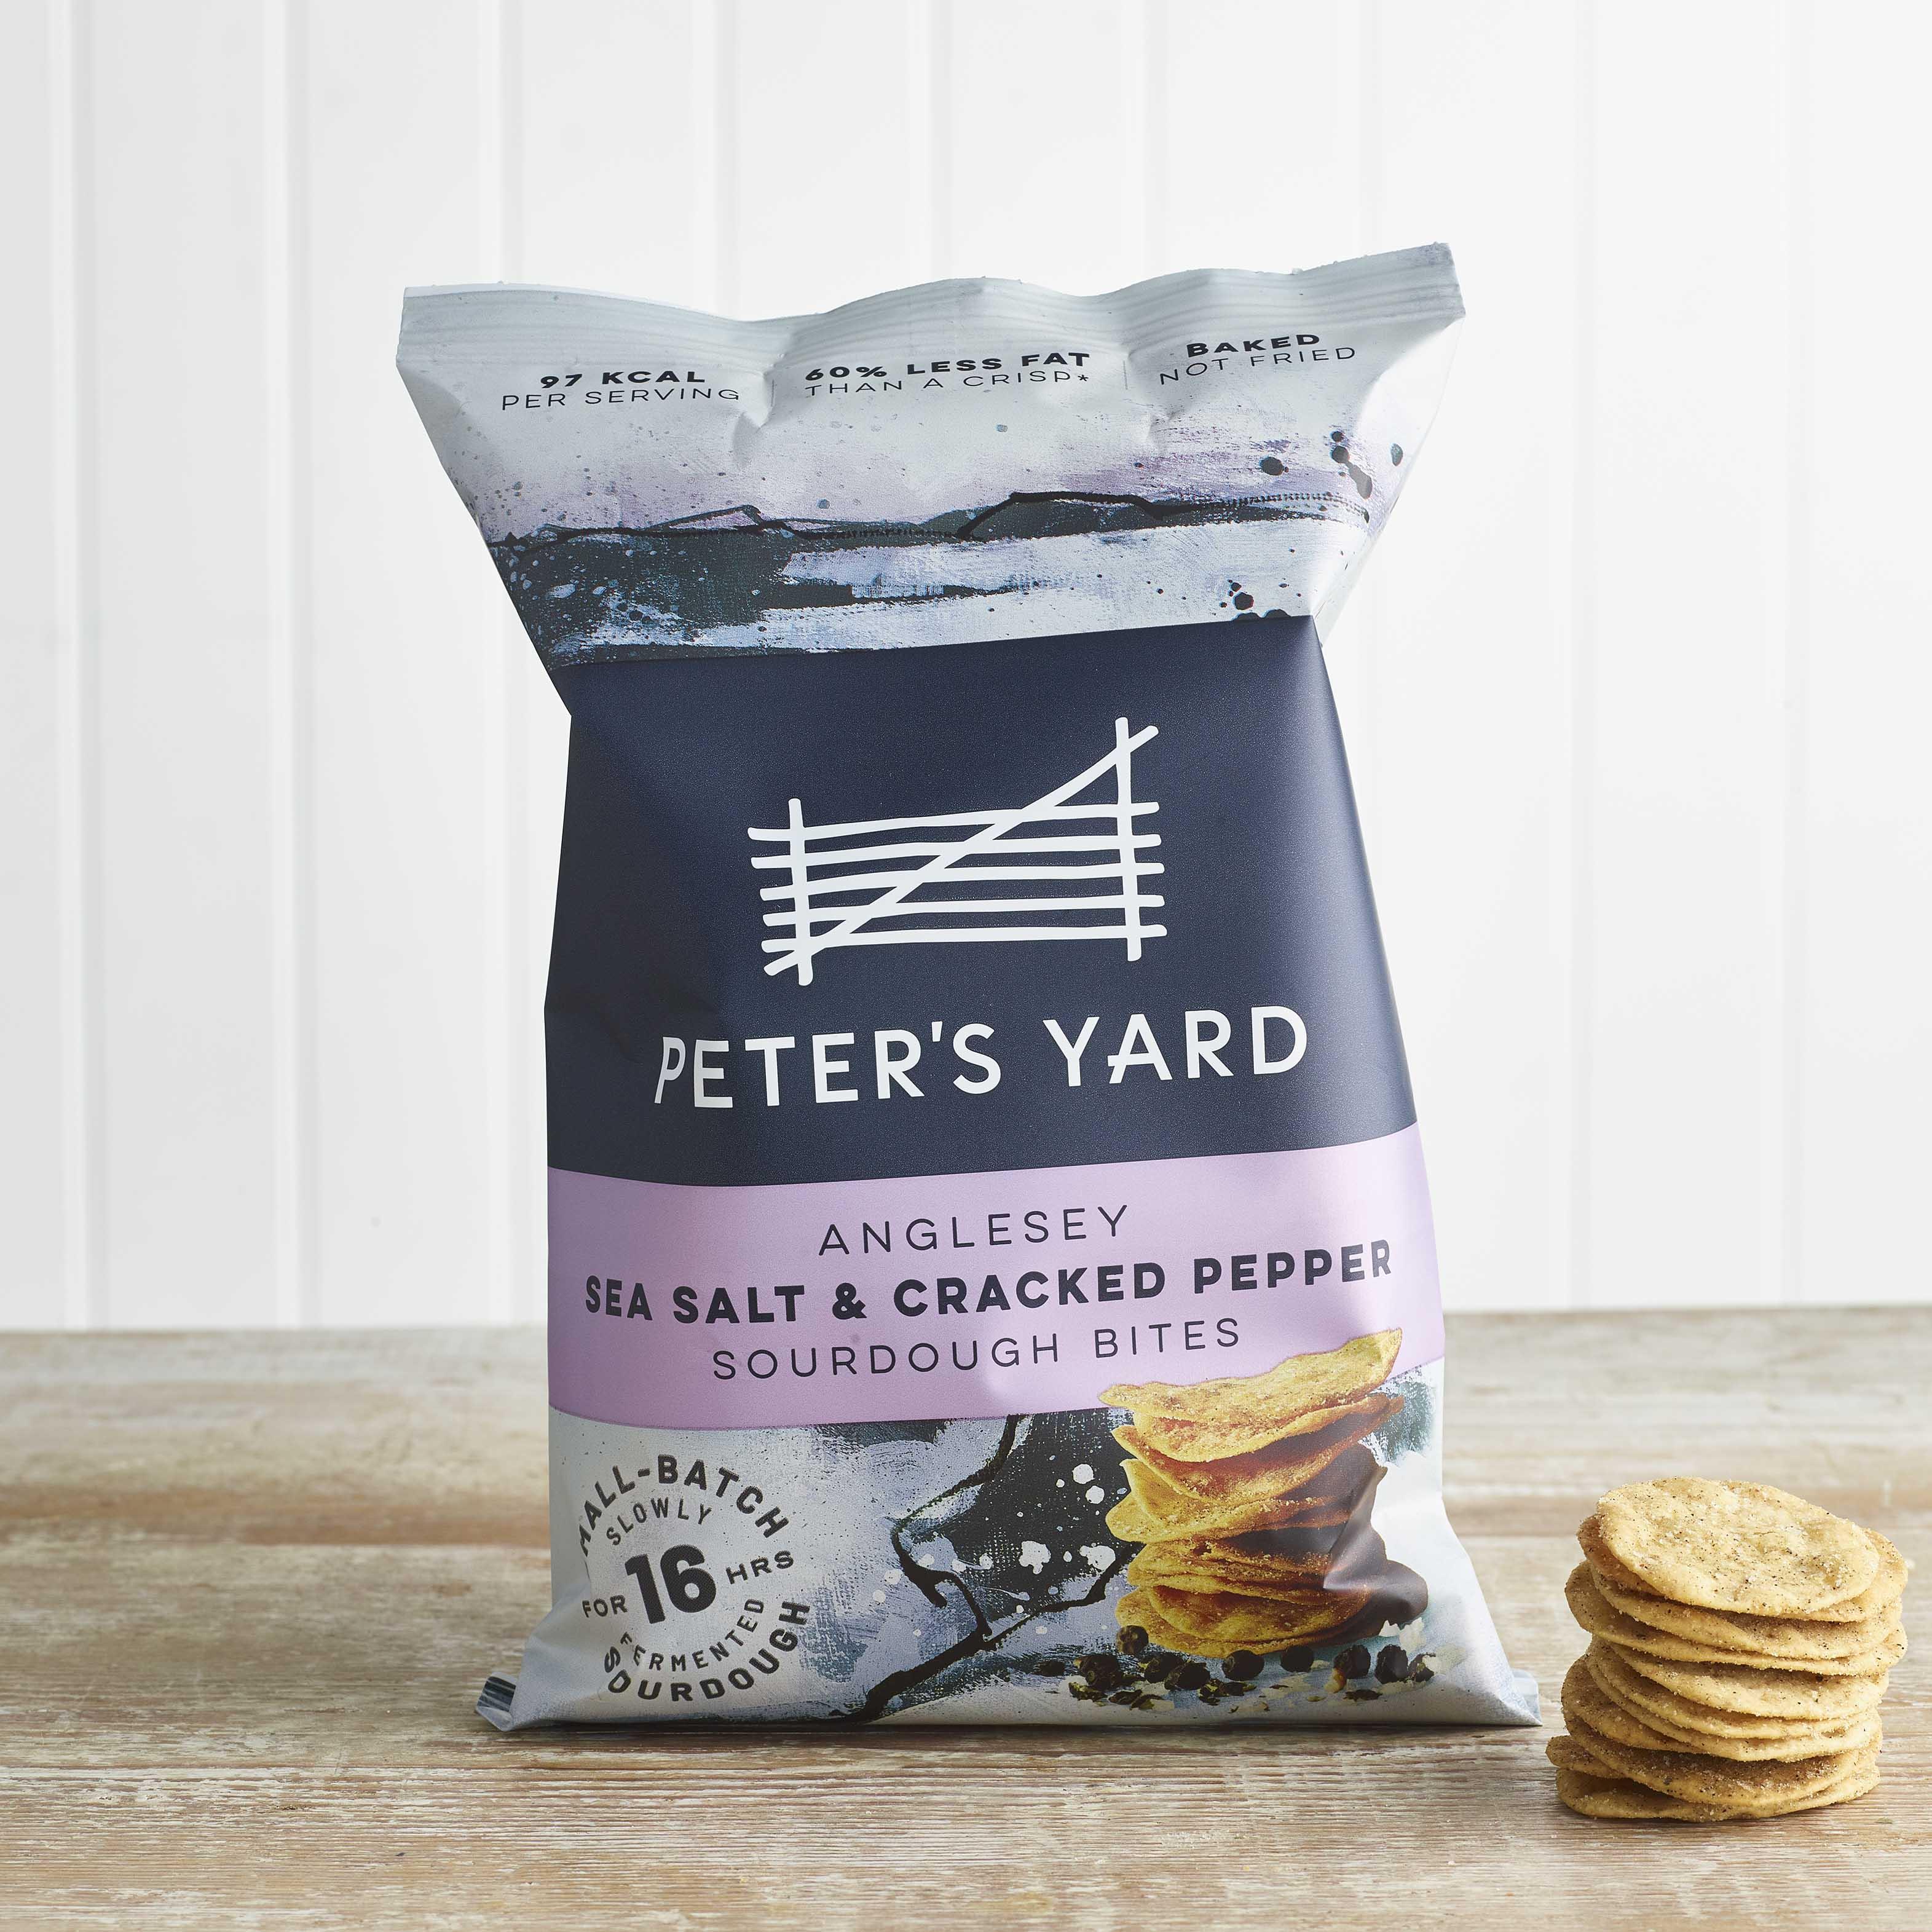 Peter's Yard Anglesey Sea Salt & Cracked Black Pepper Sourdough Bites, 90g